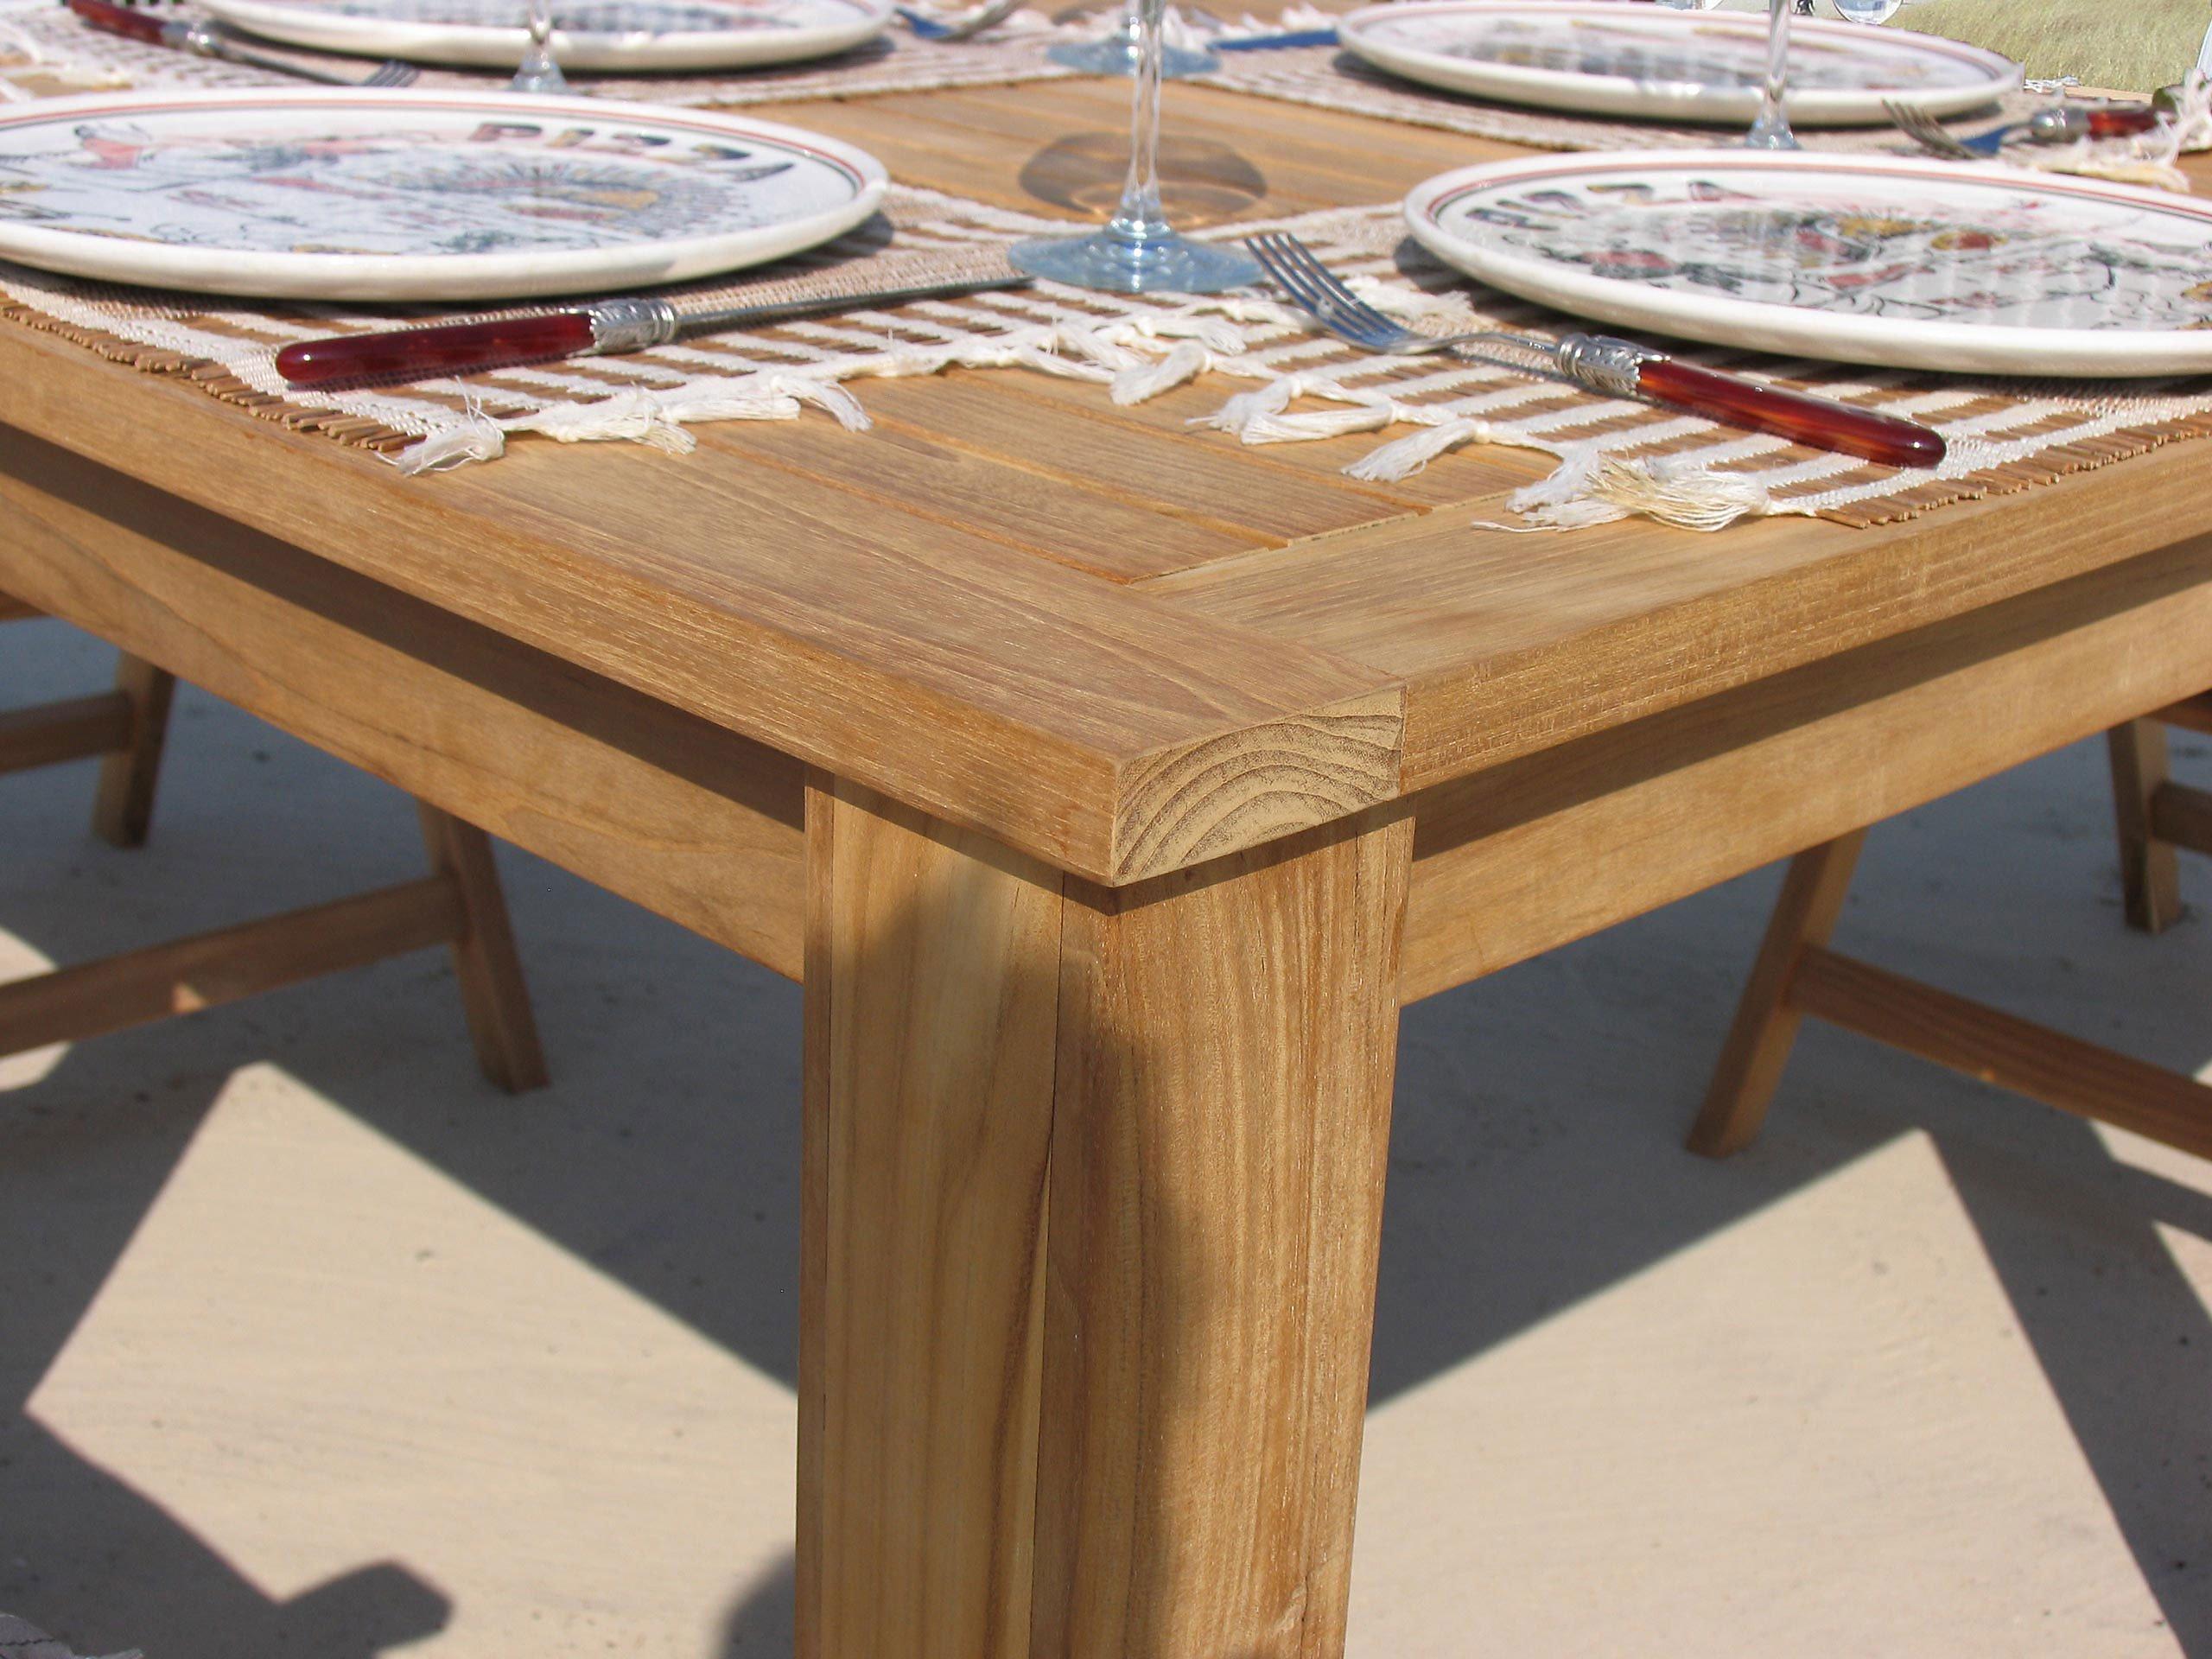 Grasekamp Teak Tisch 100x100 Cm Esstisch Gartenmobel Gartentisch